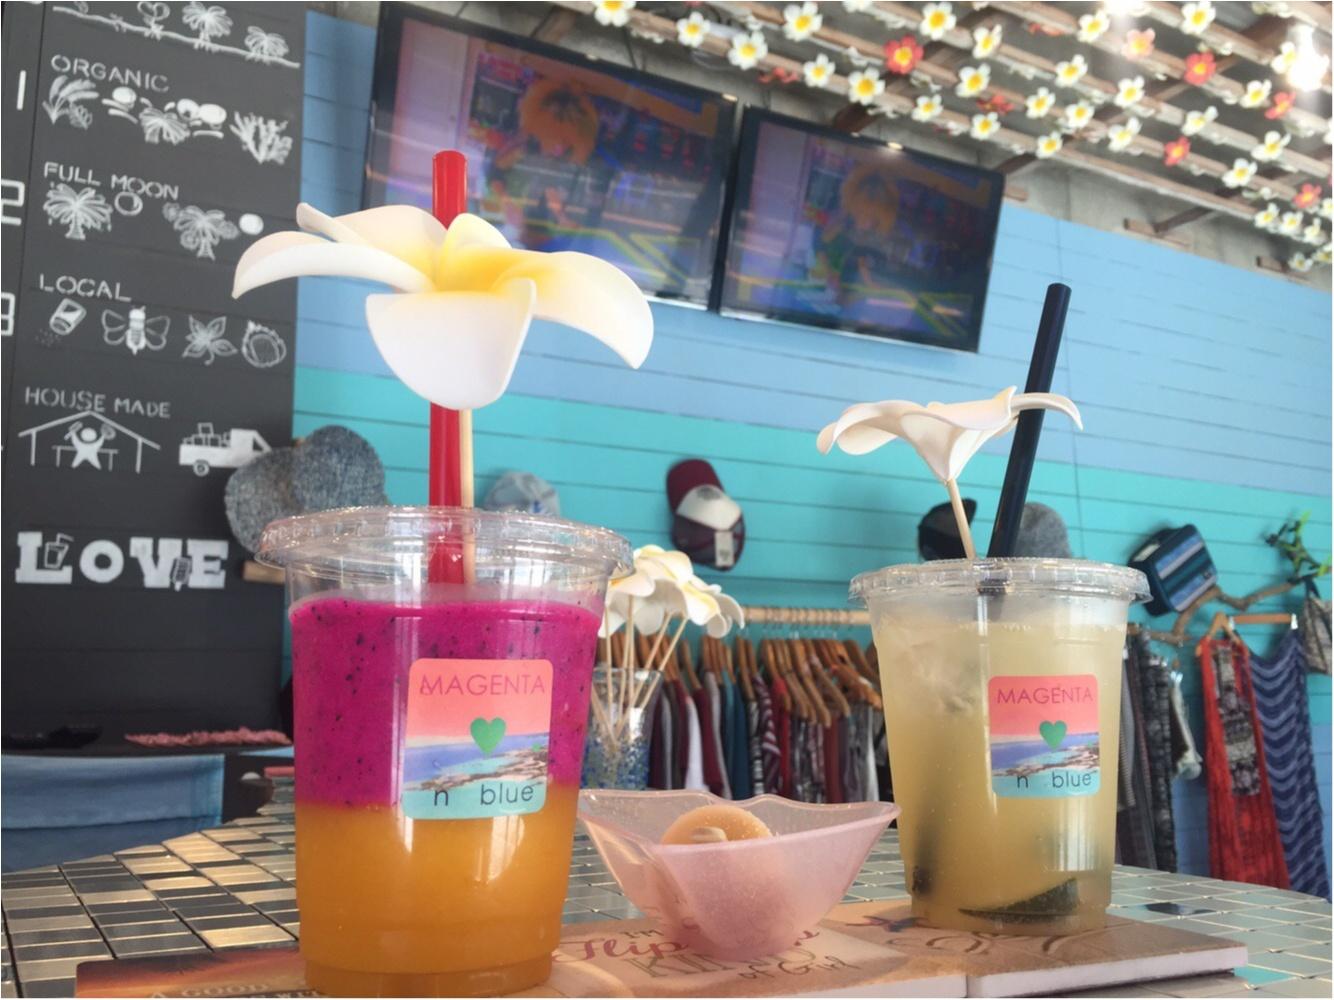 【TRIP】ほんとうは教えたくない!超フォトジェニック♡沖縄で1番すきなカフェ♡ MAGENTA n blue ♡_9